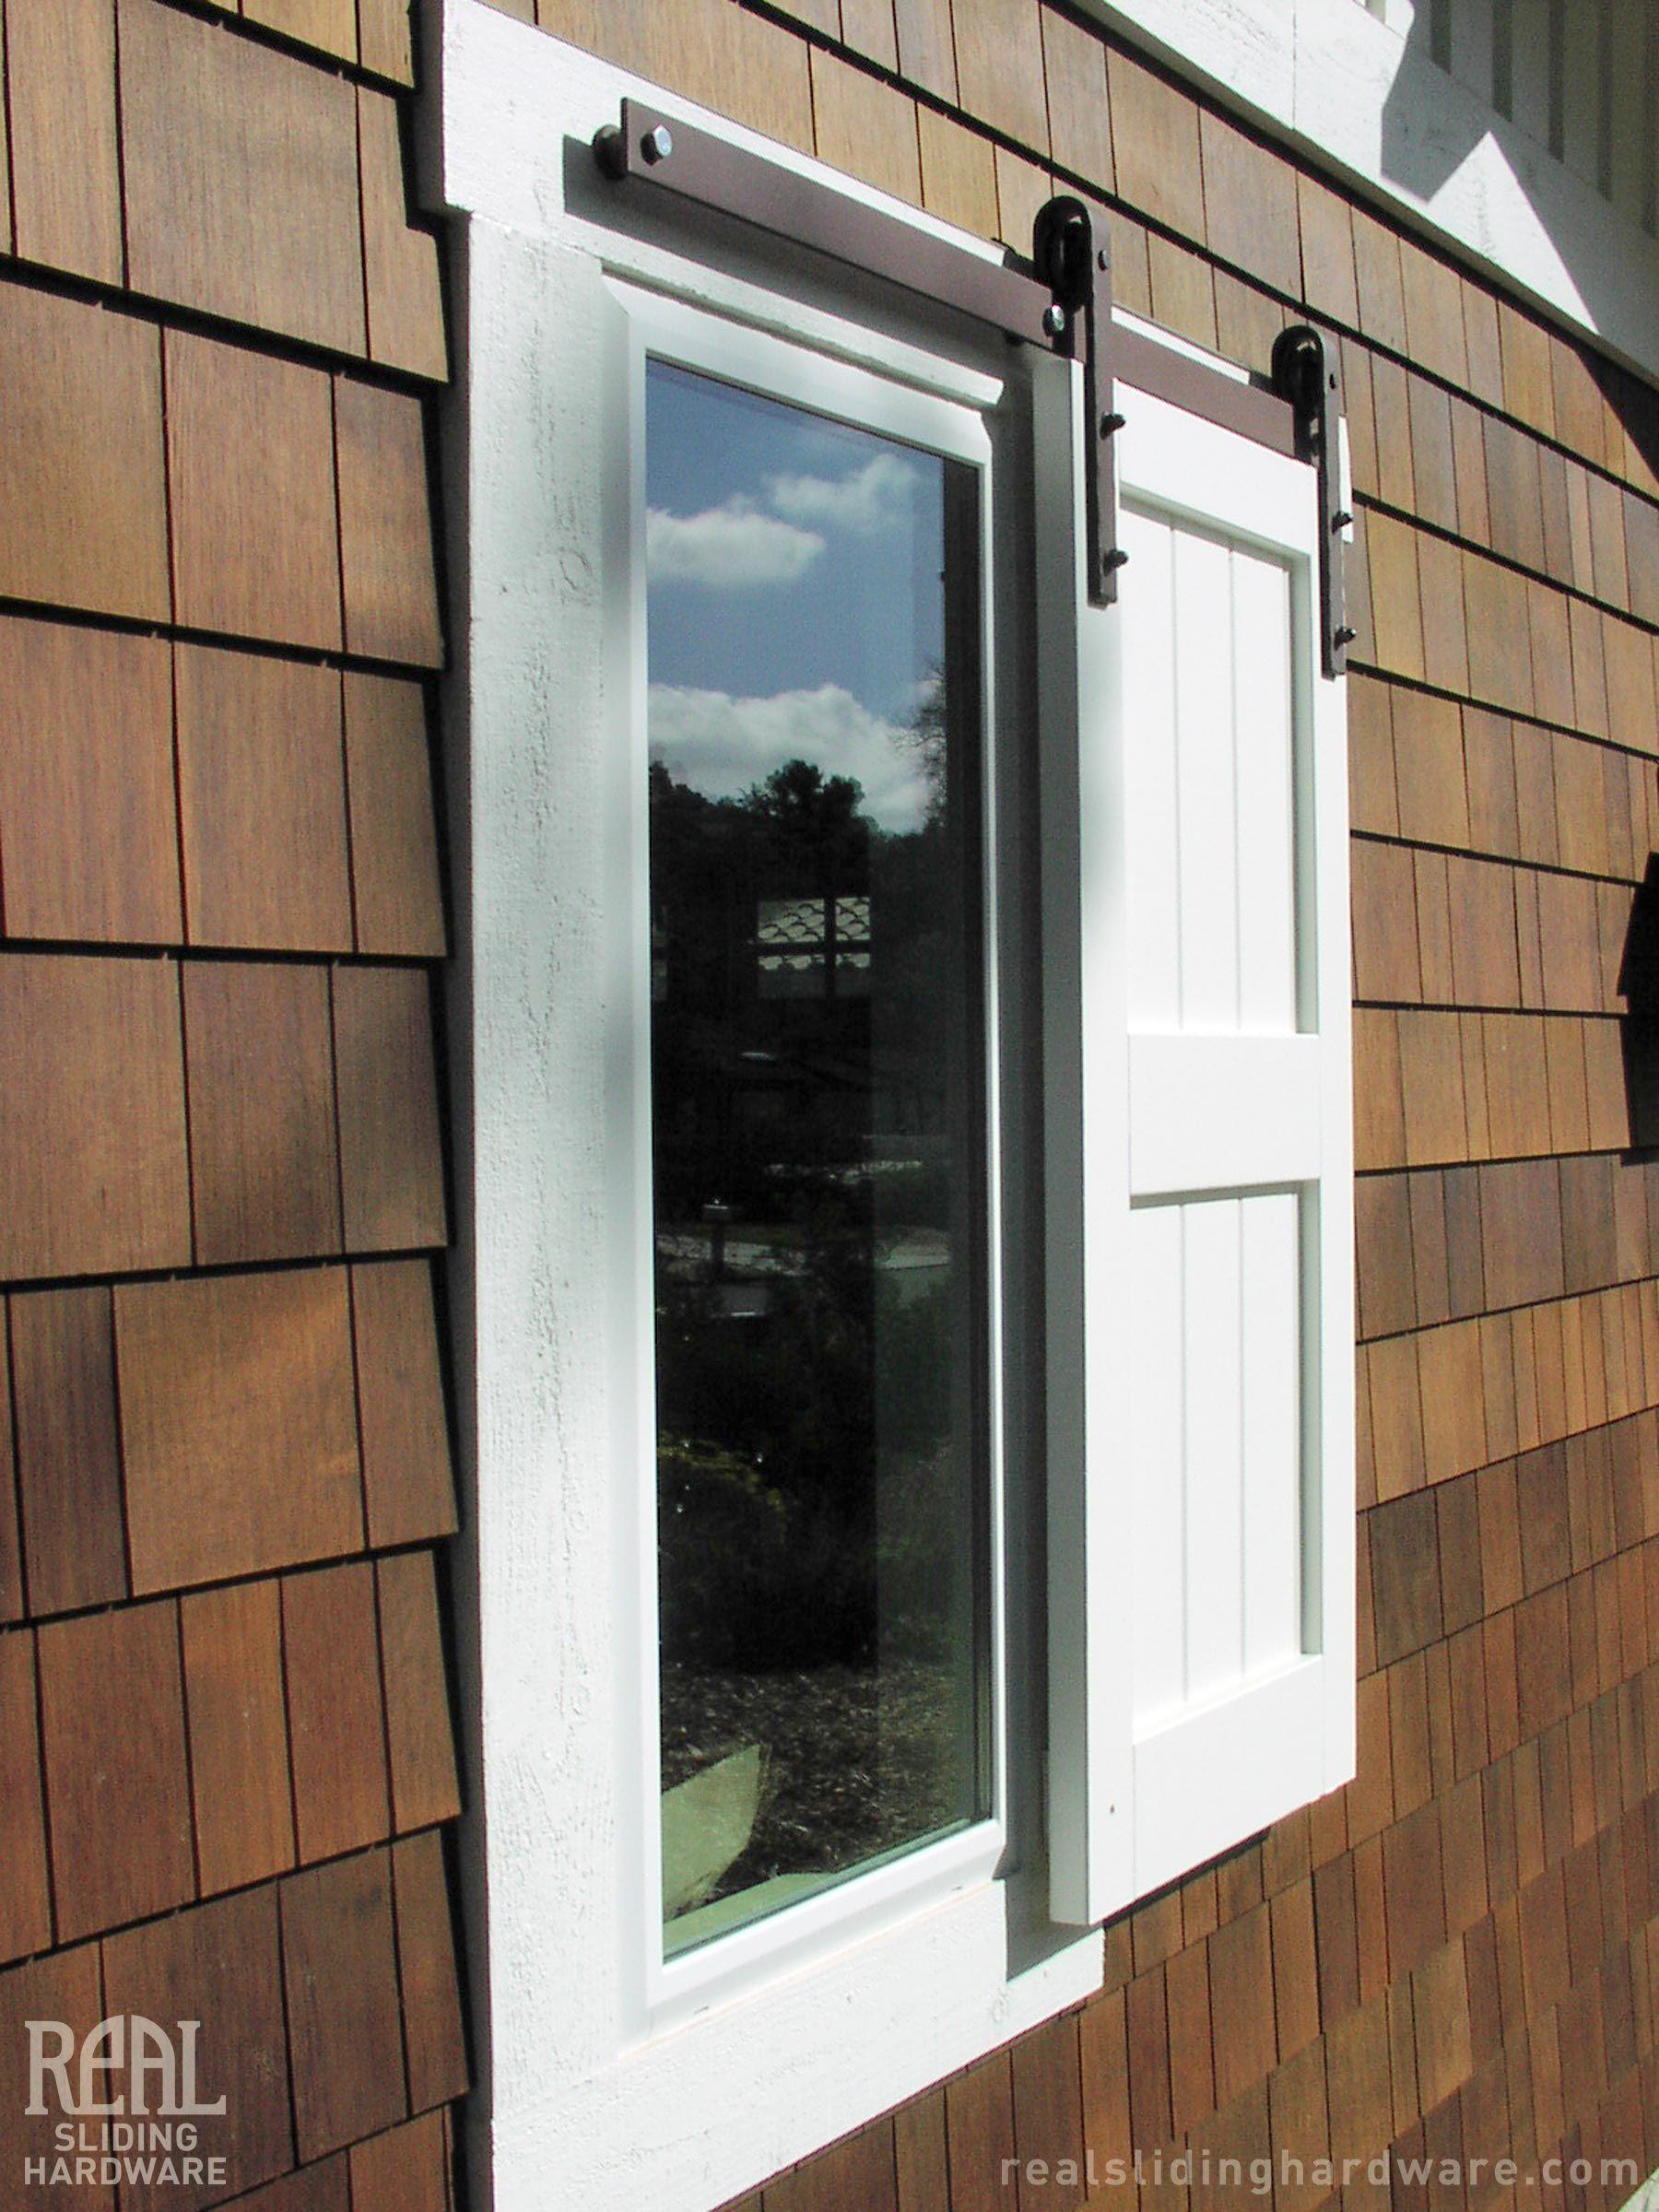 Barn Door Hardware By Real Sliding Hardware Exterior Barn Doors Window Shutters Exterior Shutters Exterior